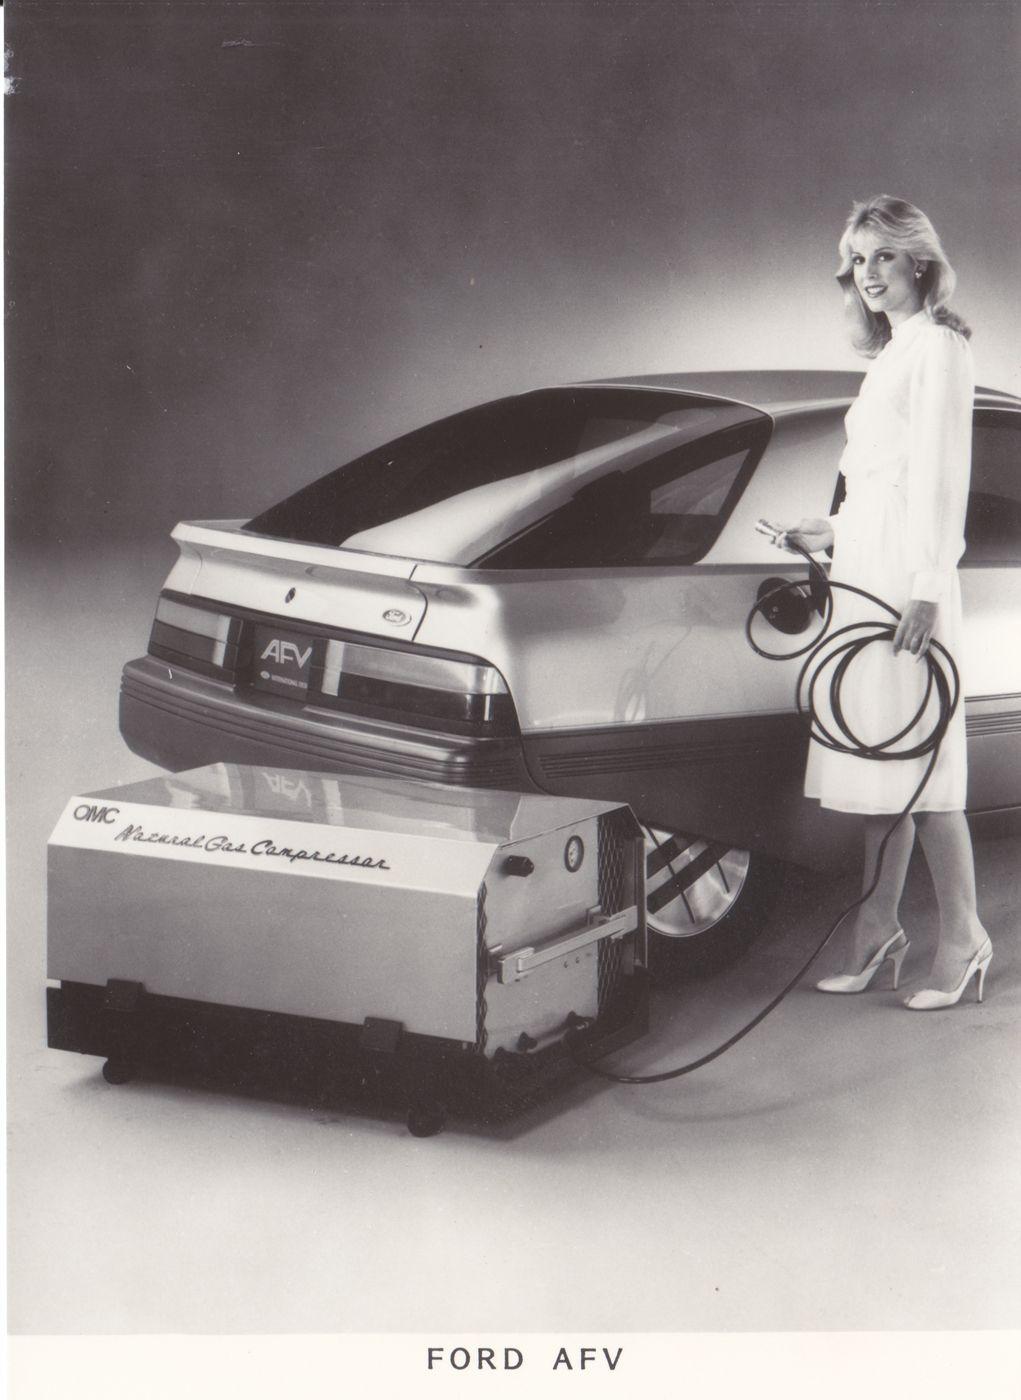 Ford Afv Concept Car Rai Nl 1983 Concept Cars Alternative Fuel Ford Motor Company